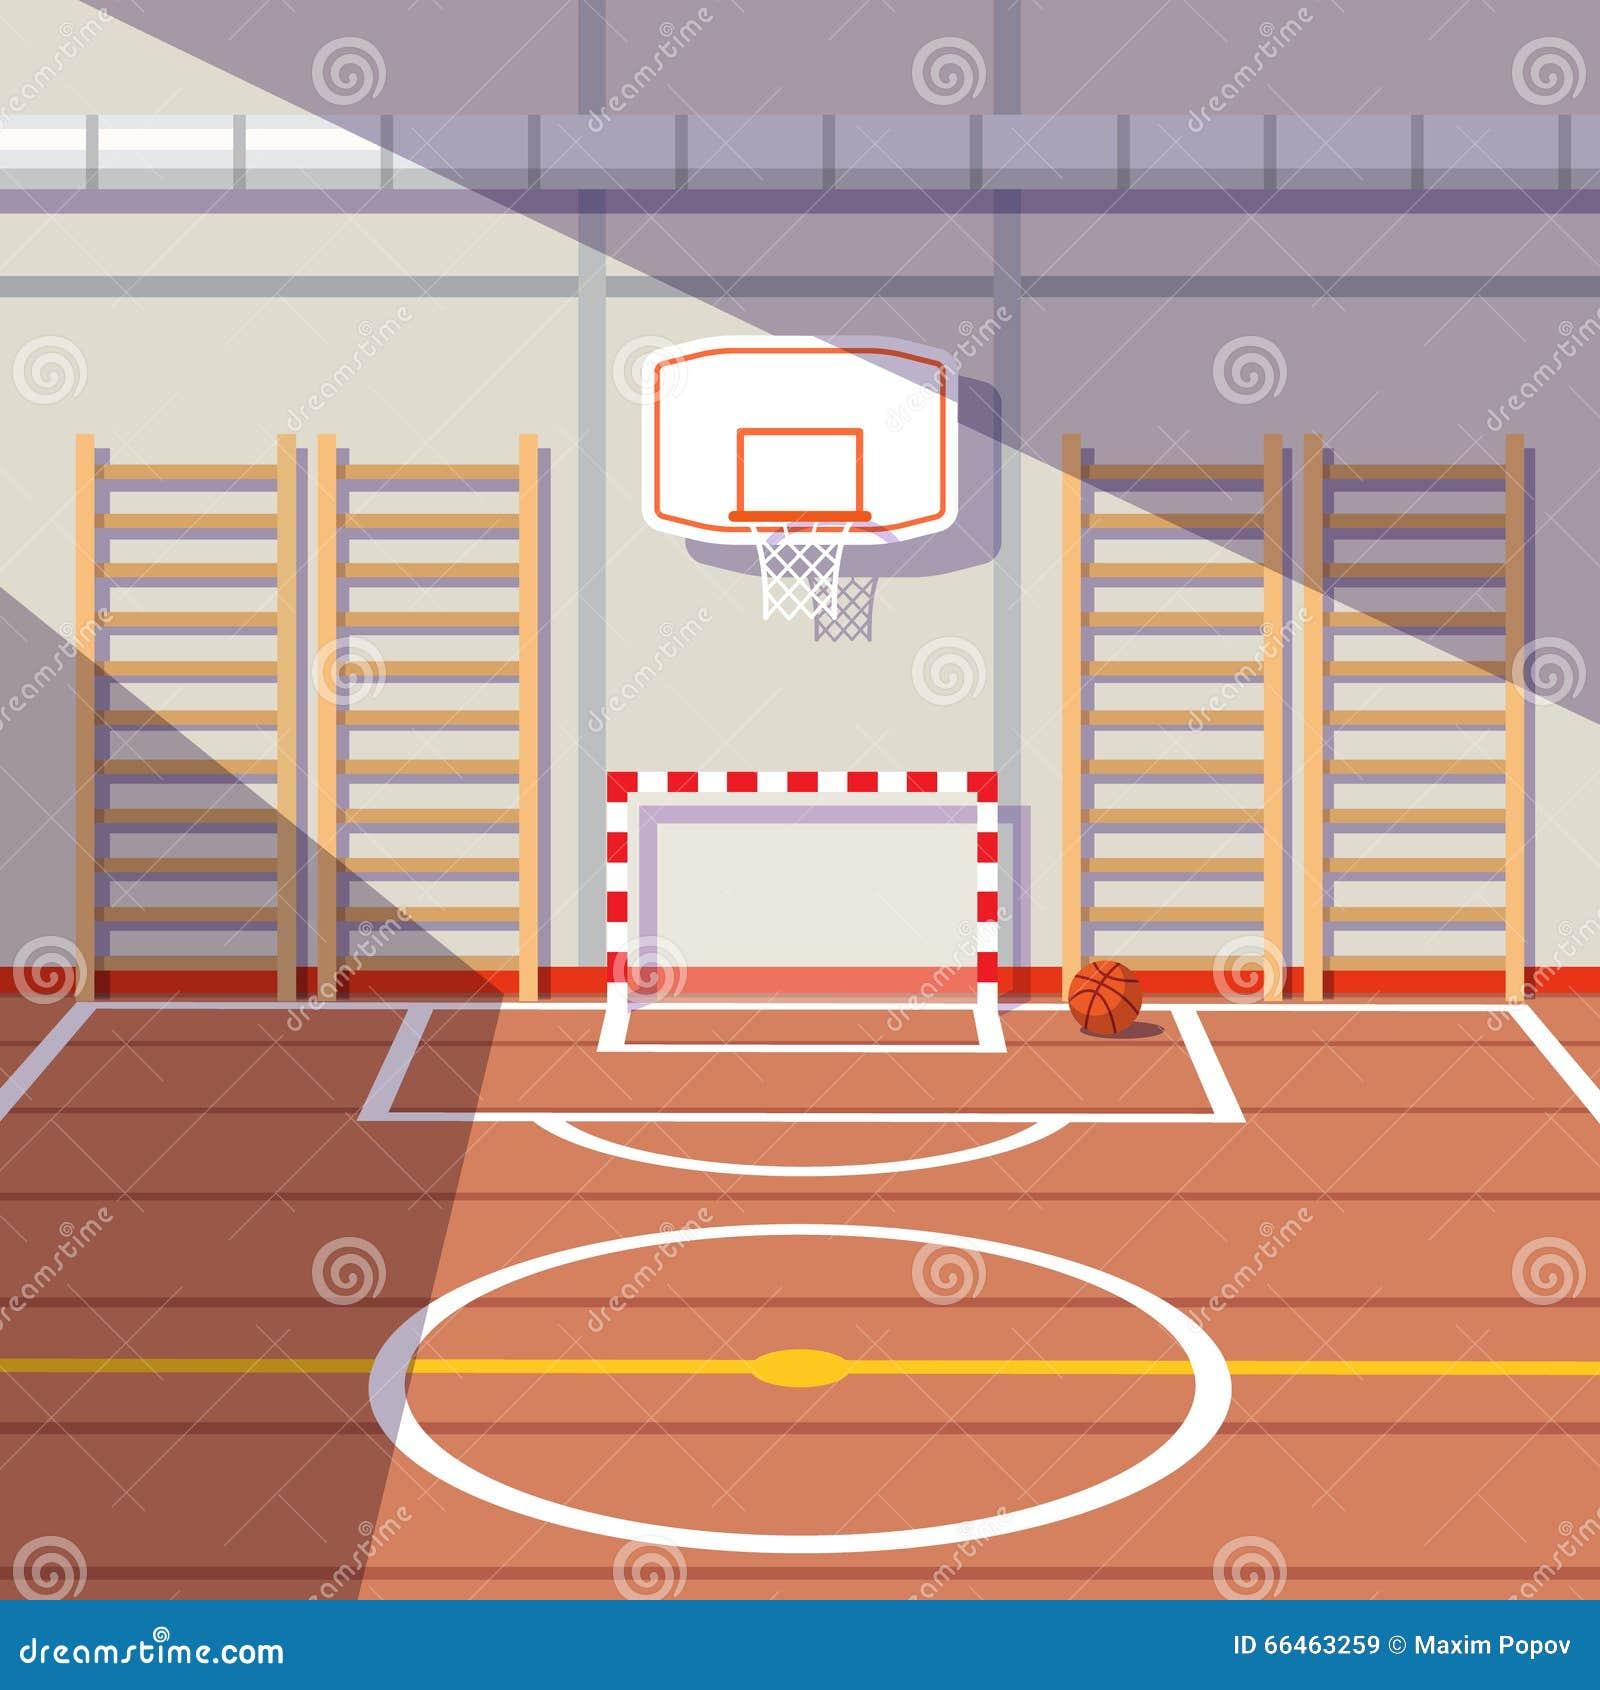 School Or University Gym Hall Cartoon Vector   CartoonDealer.com #66463259